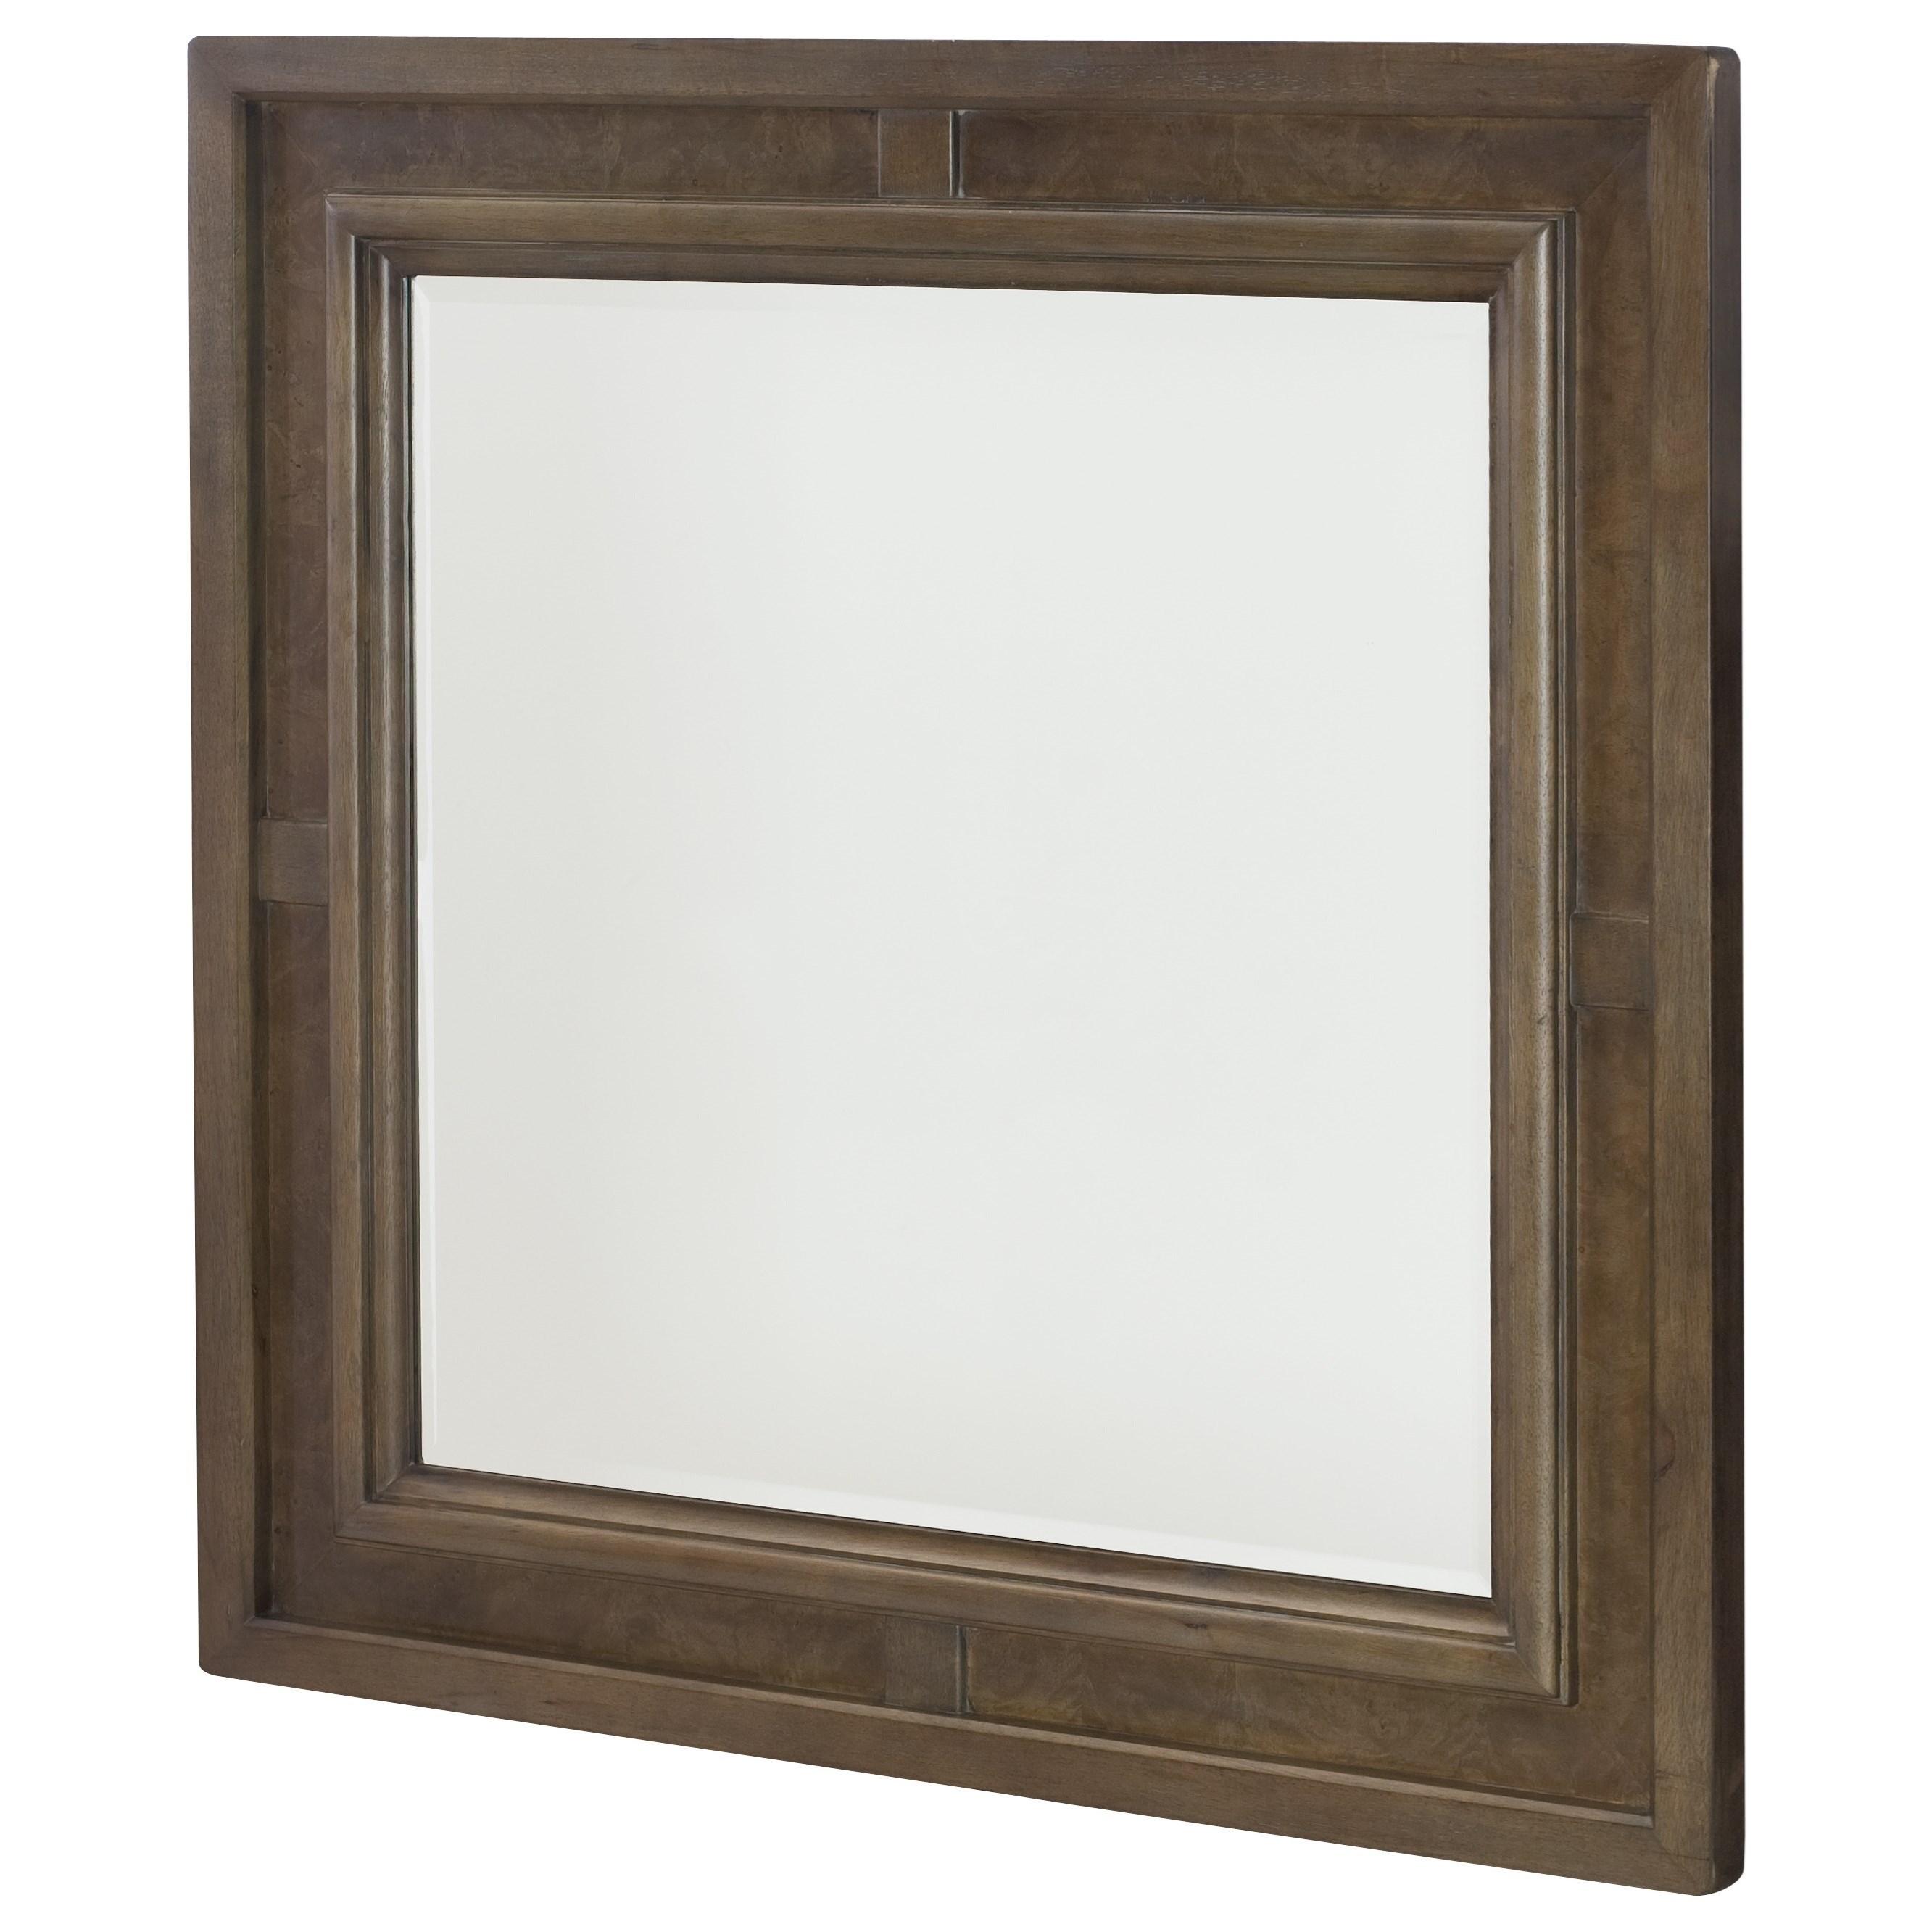 American Drew Park Studio Mirror - Item Number: 488-030